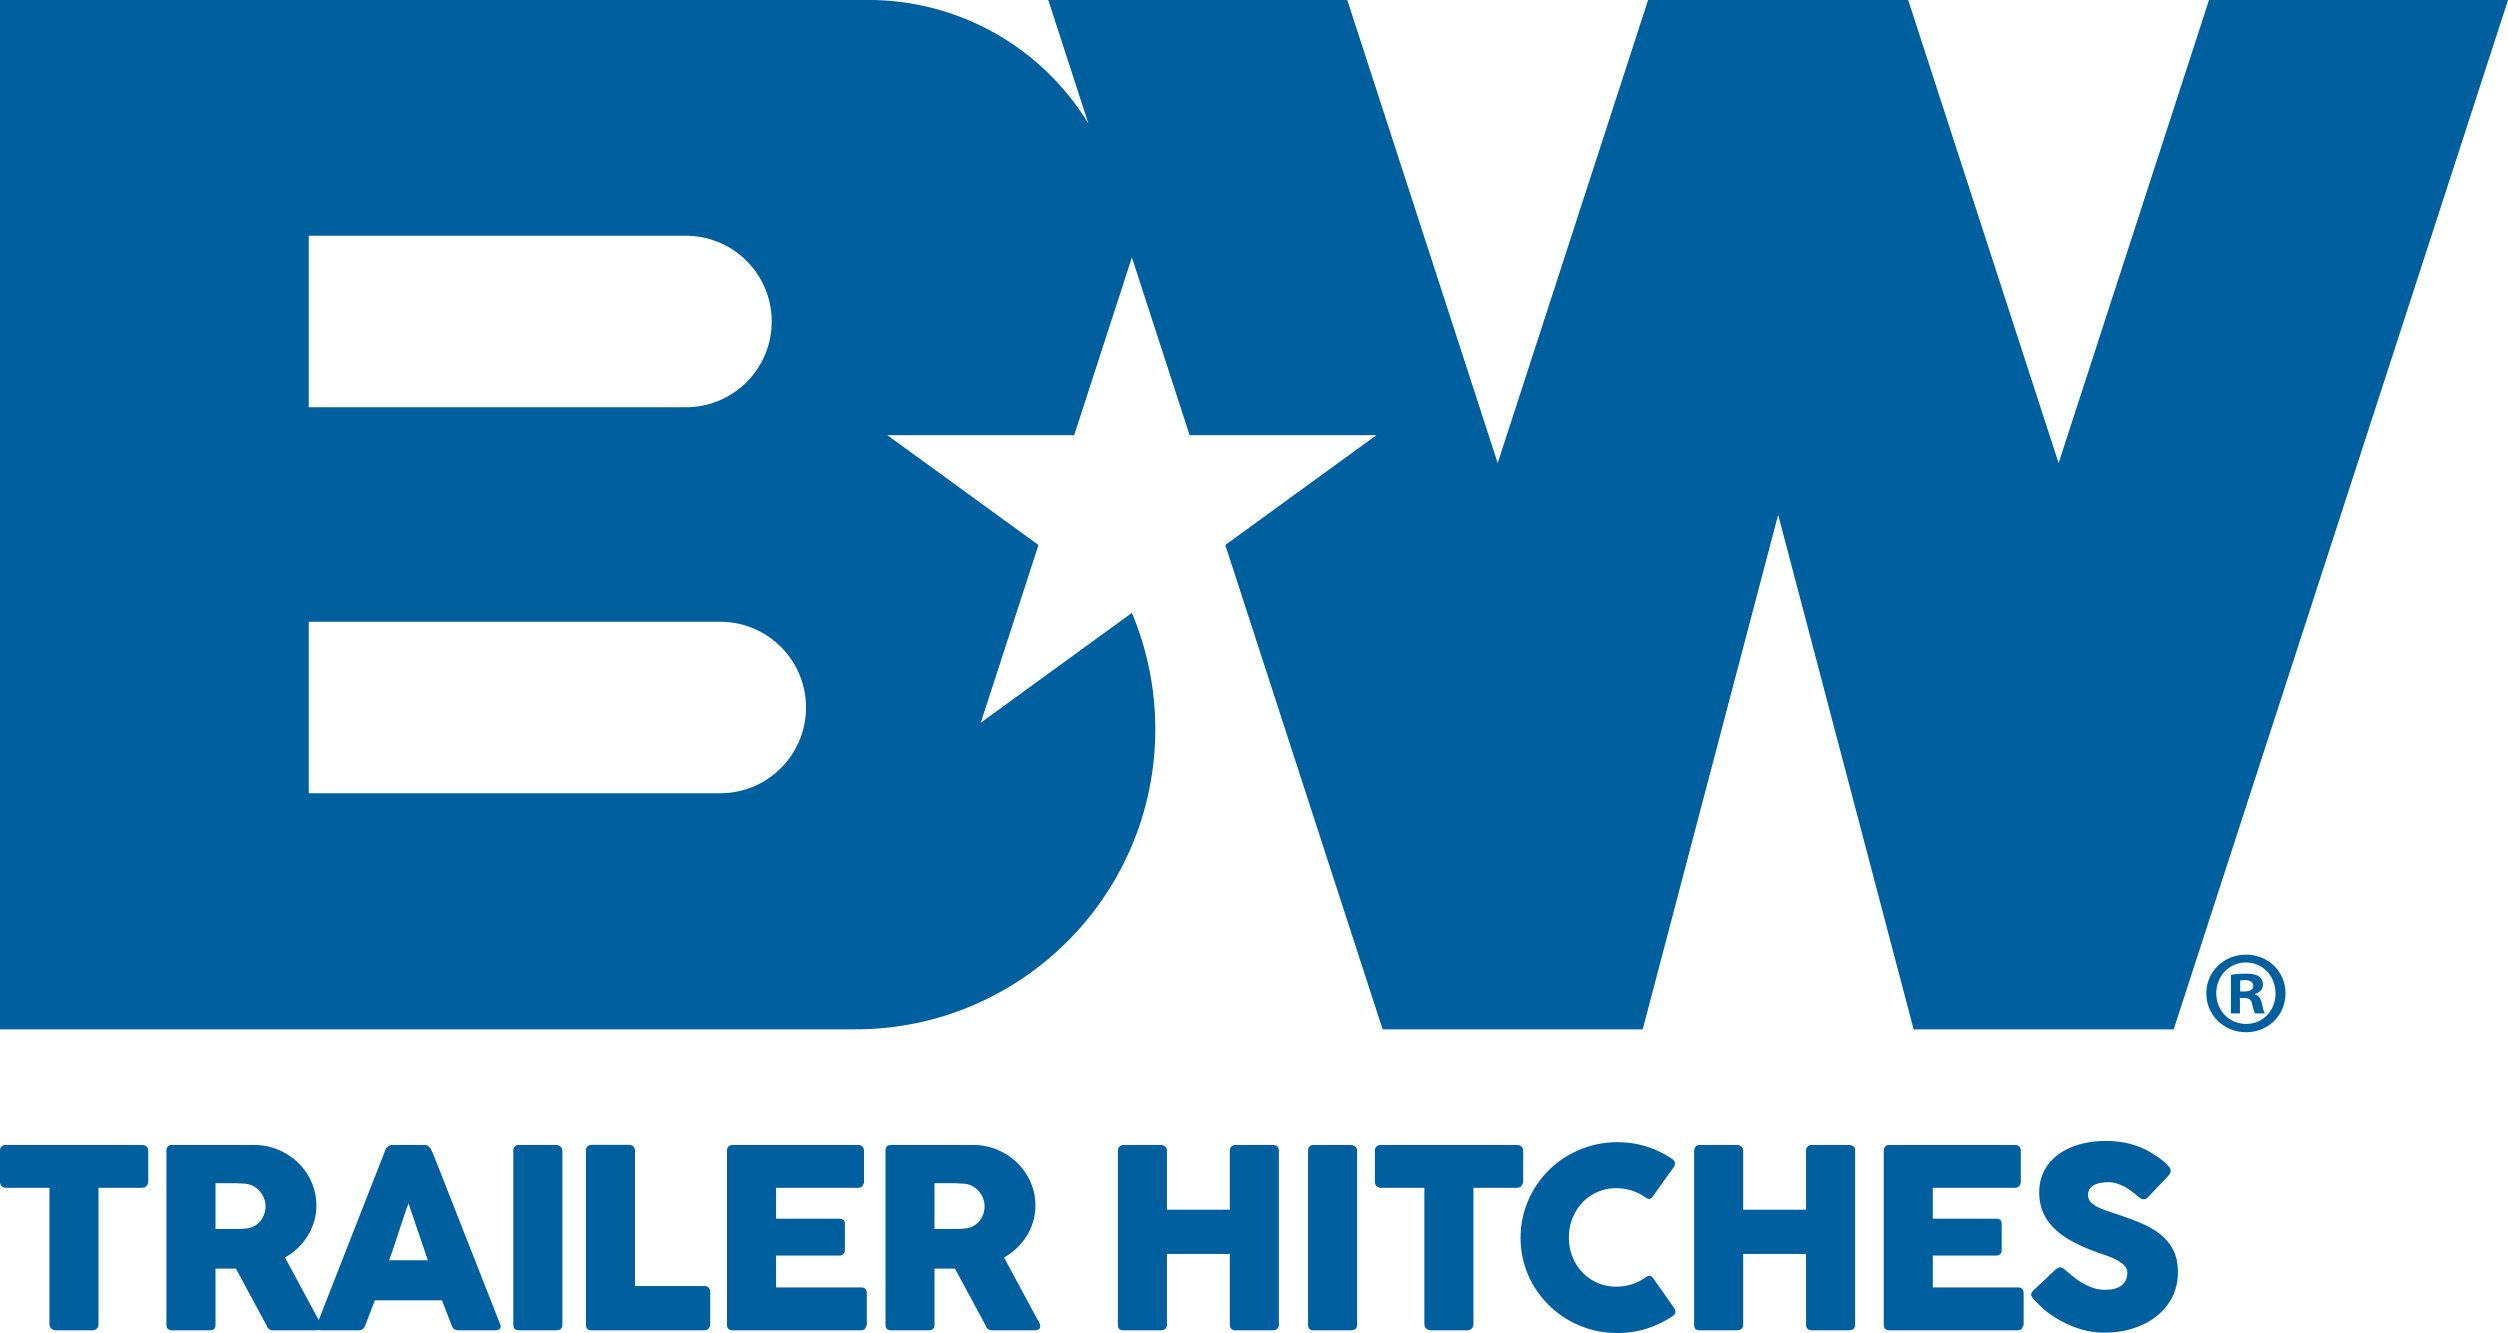 B&W Trailer Hitches